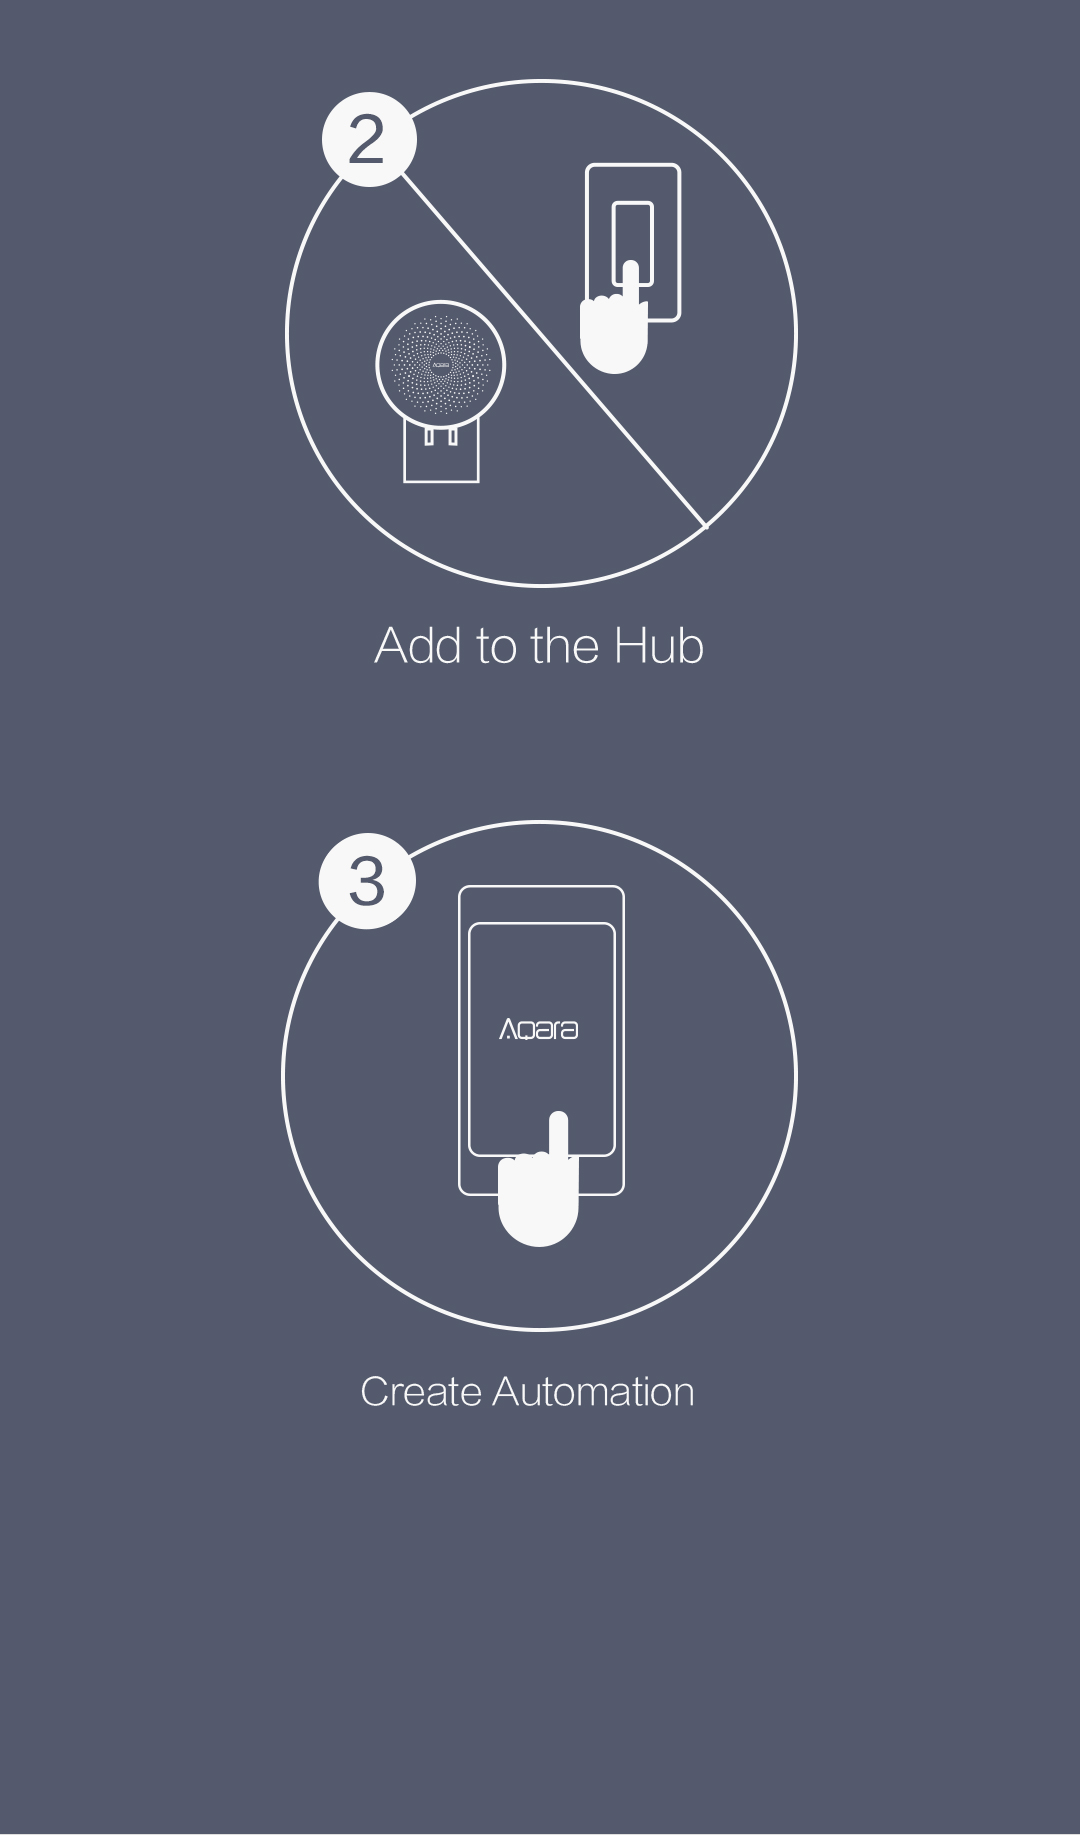 Aqara smart wall switch with neutral setup